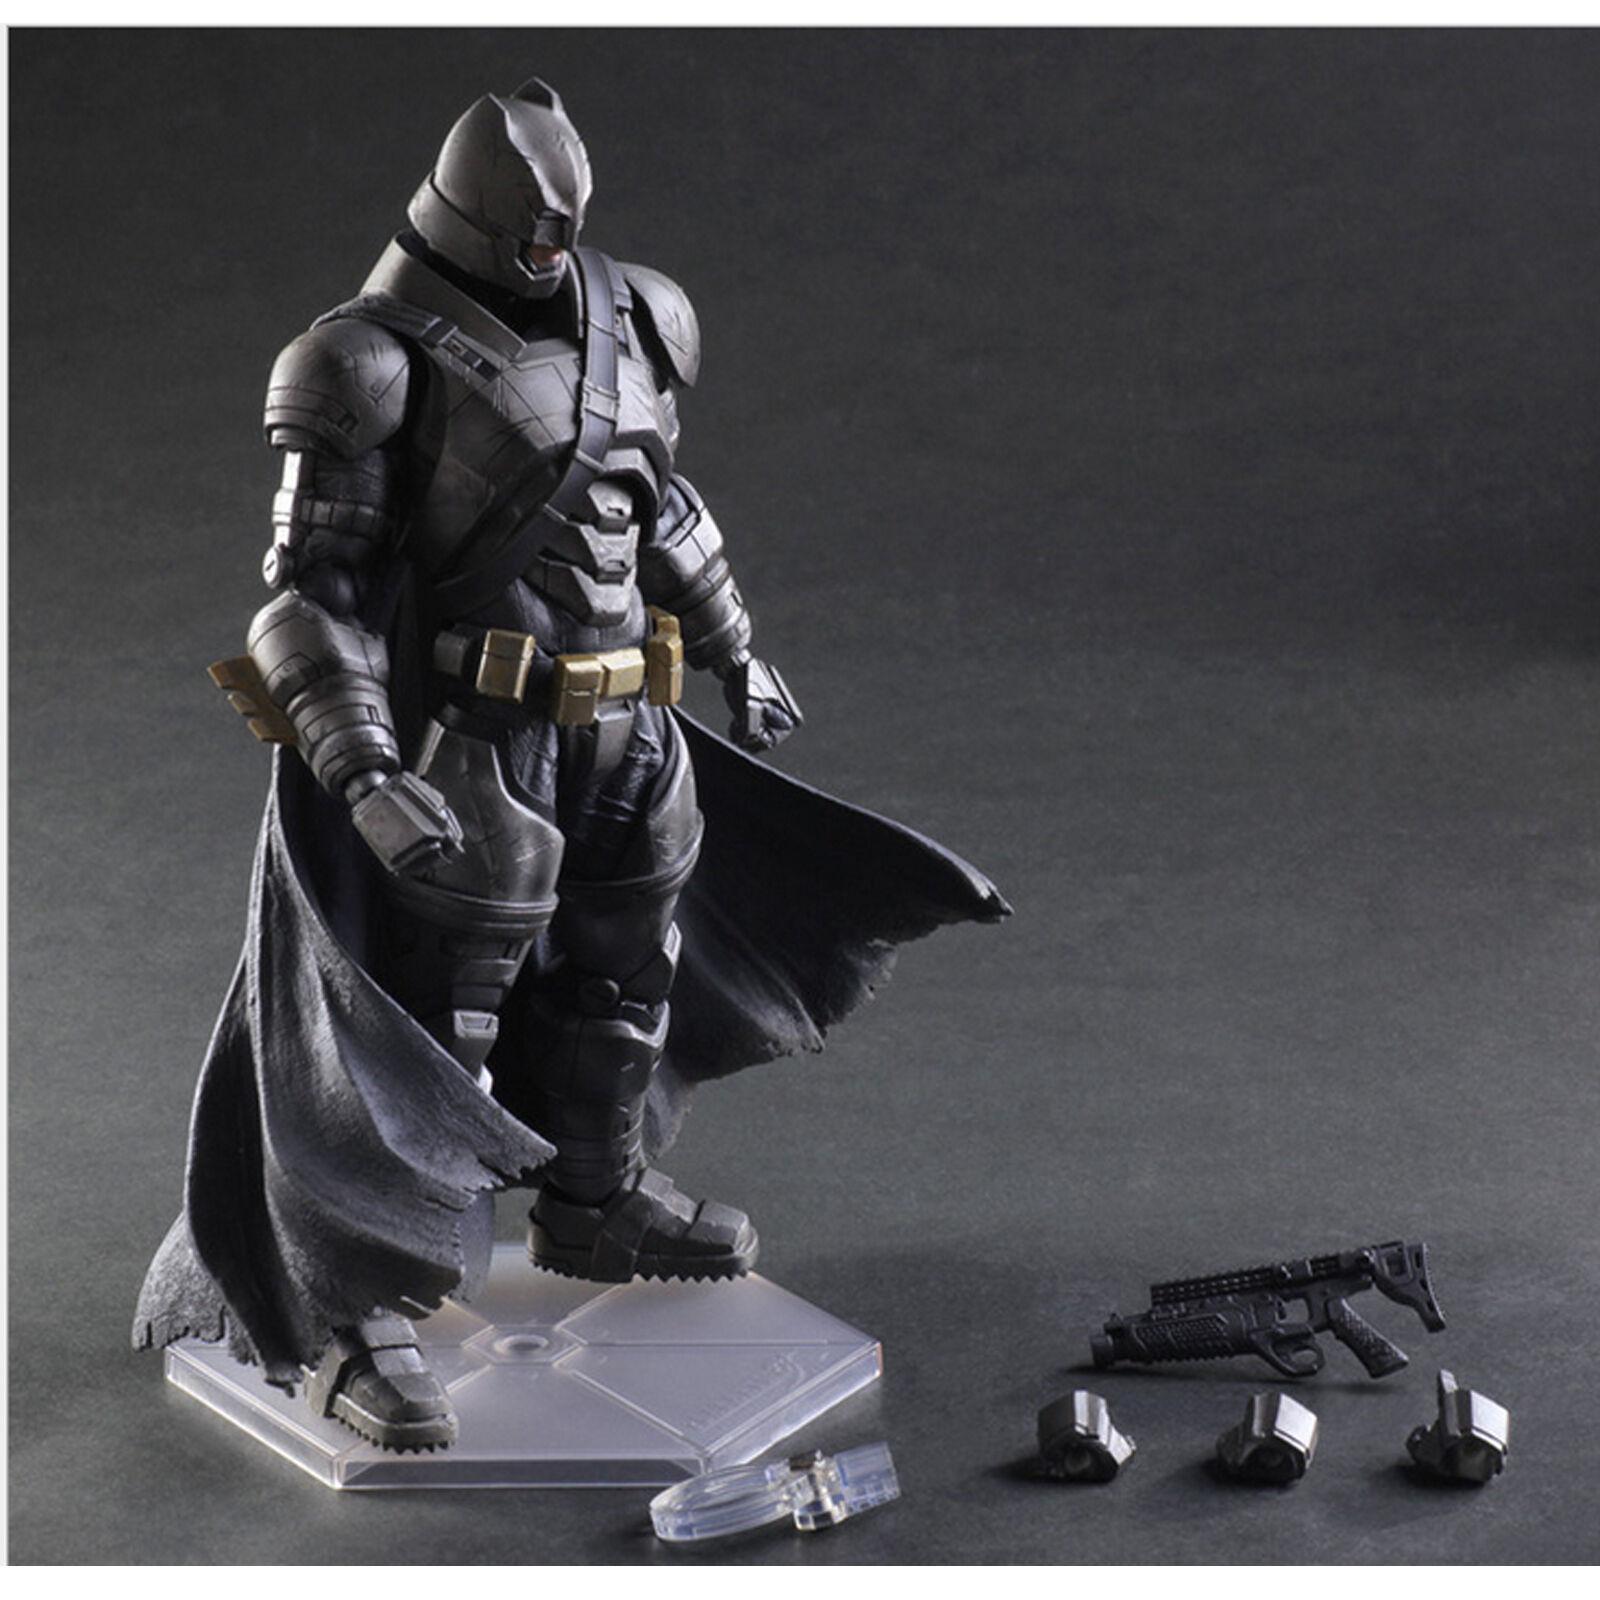 Batman und superman, batman action - figur - gepanzert.